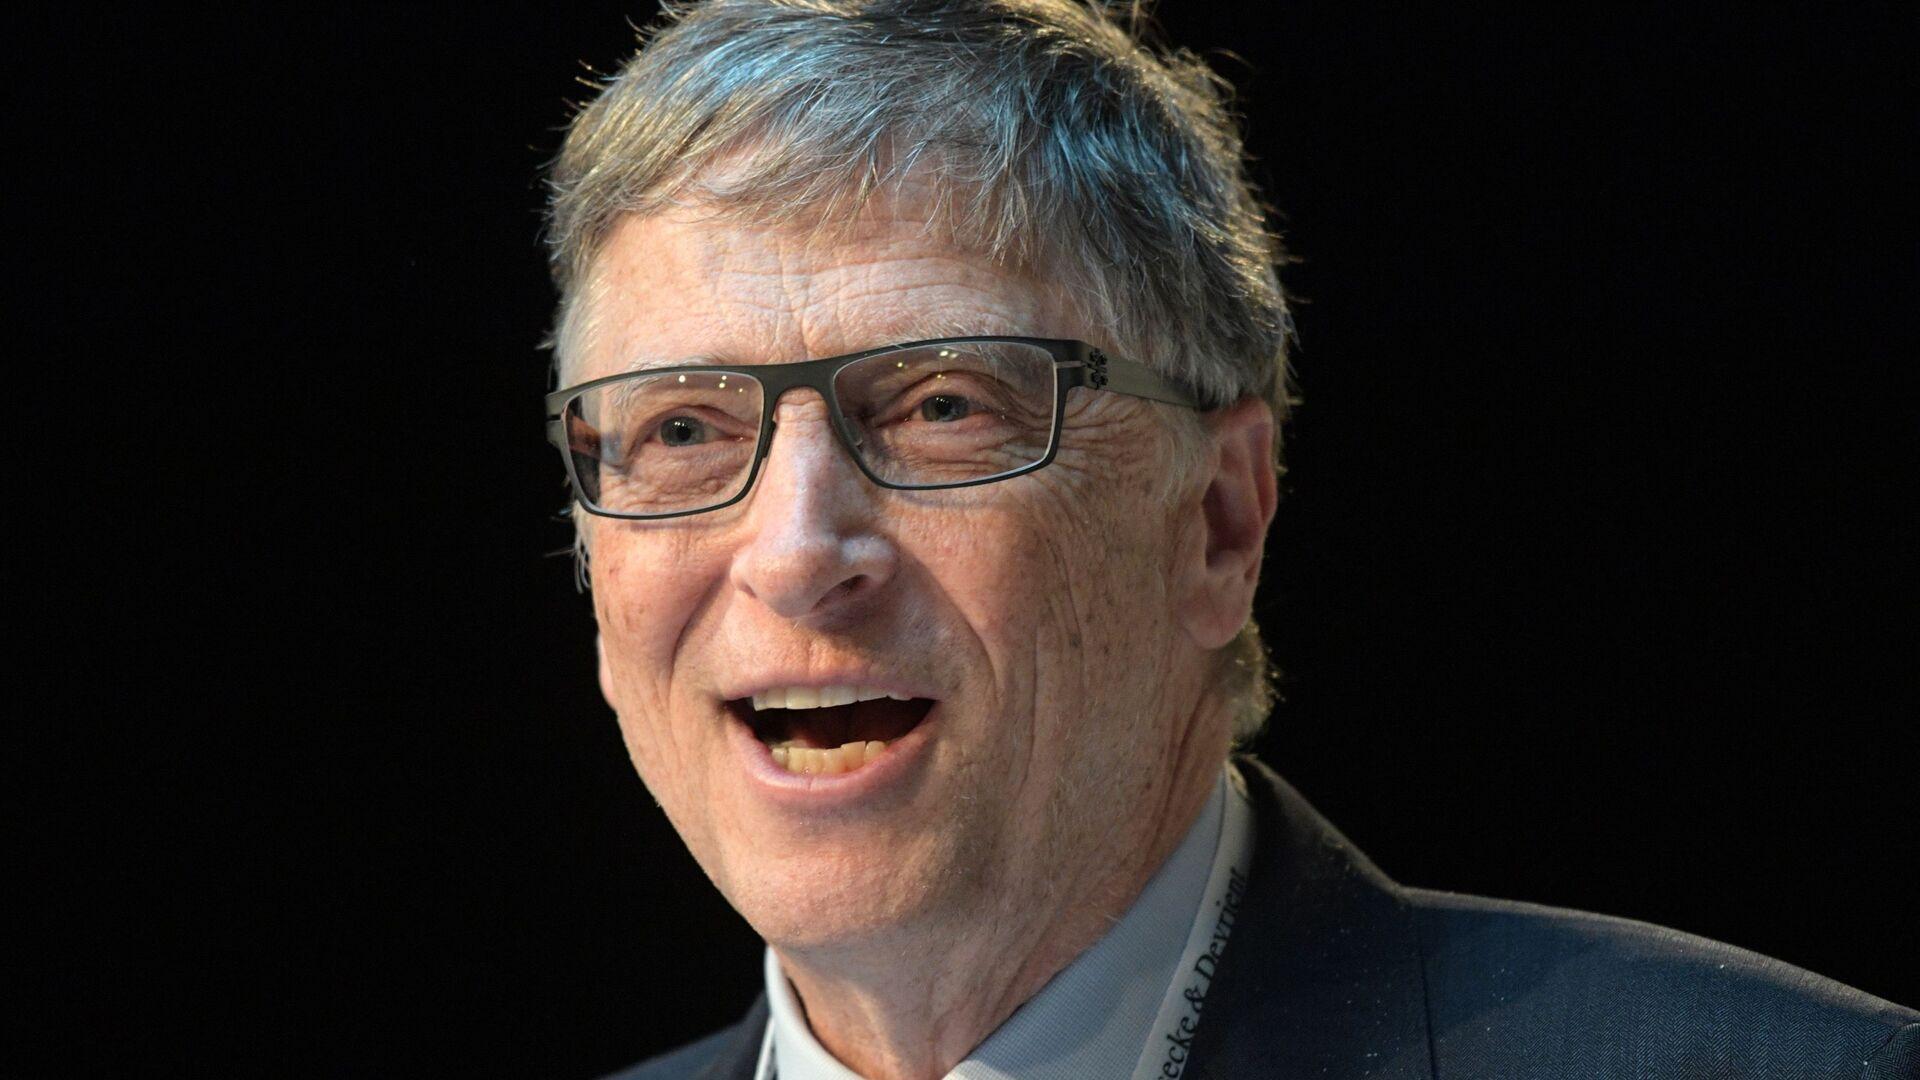 Билл Гейтс, архивное фото - Sputnik Тоҷикистон, 1920, 07.10.2021